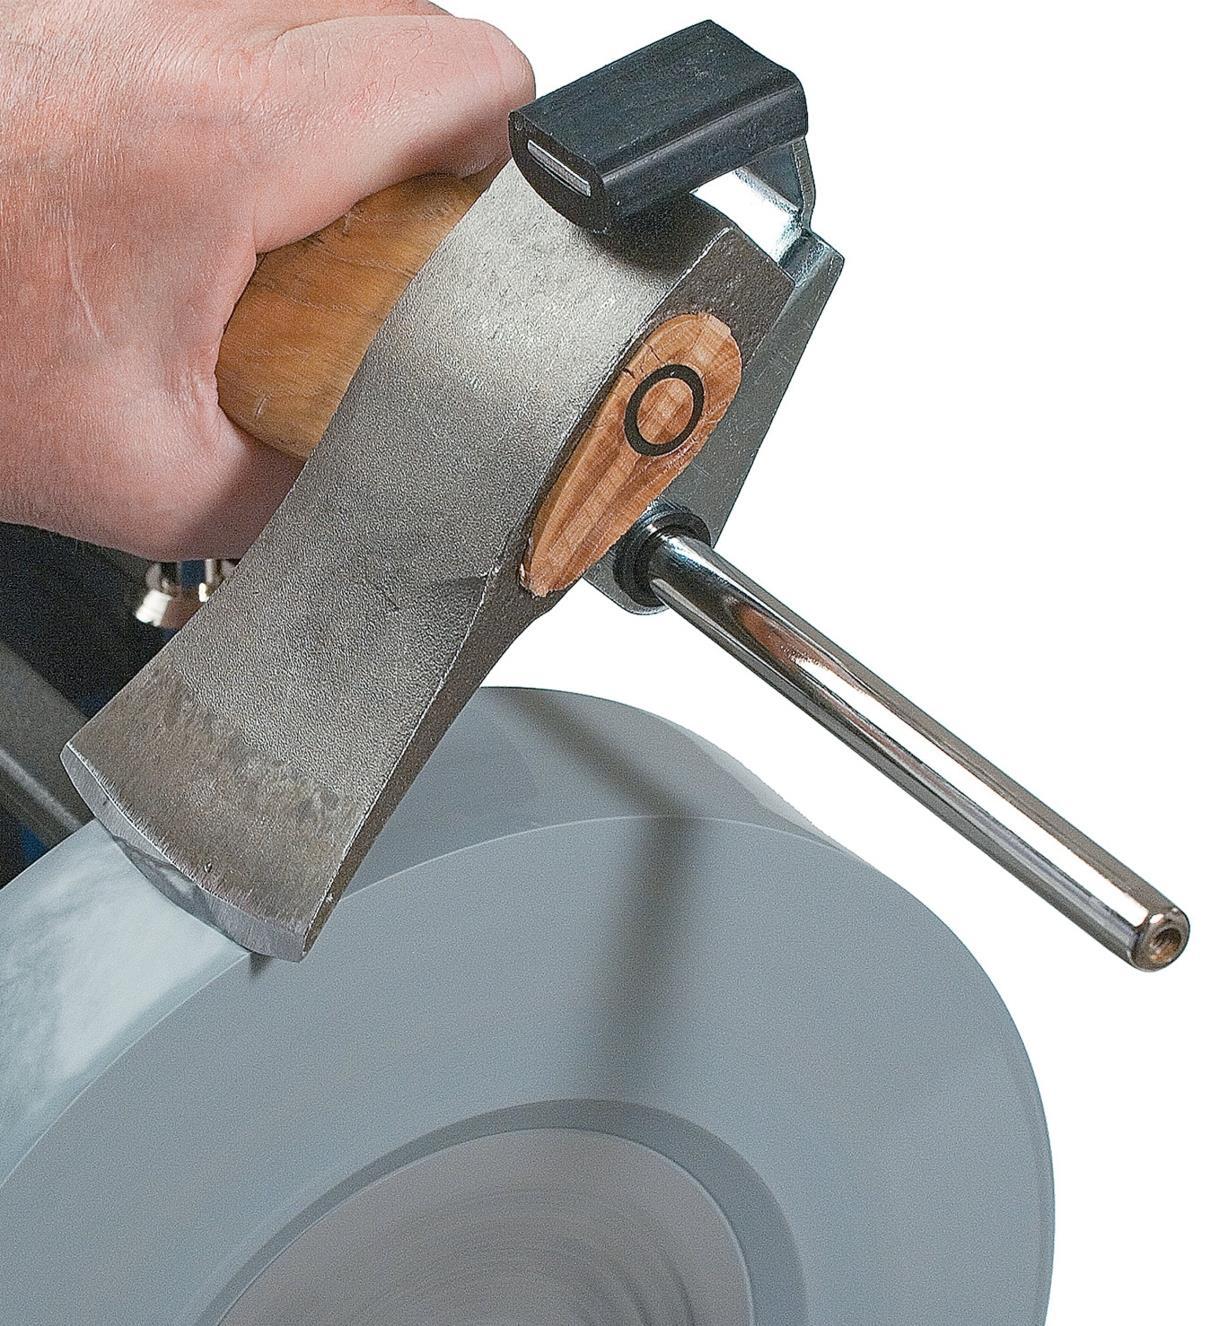 68M0124 - Tormek Axe Jig